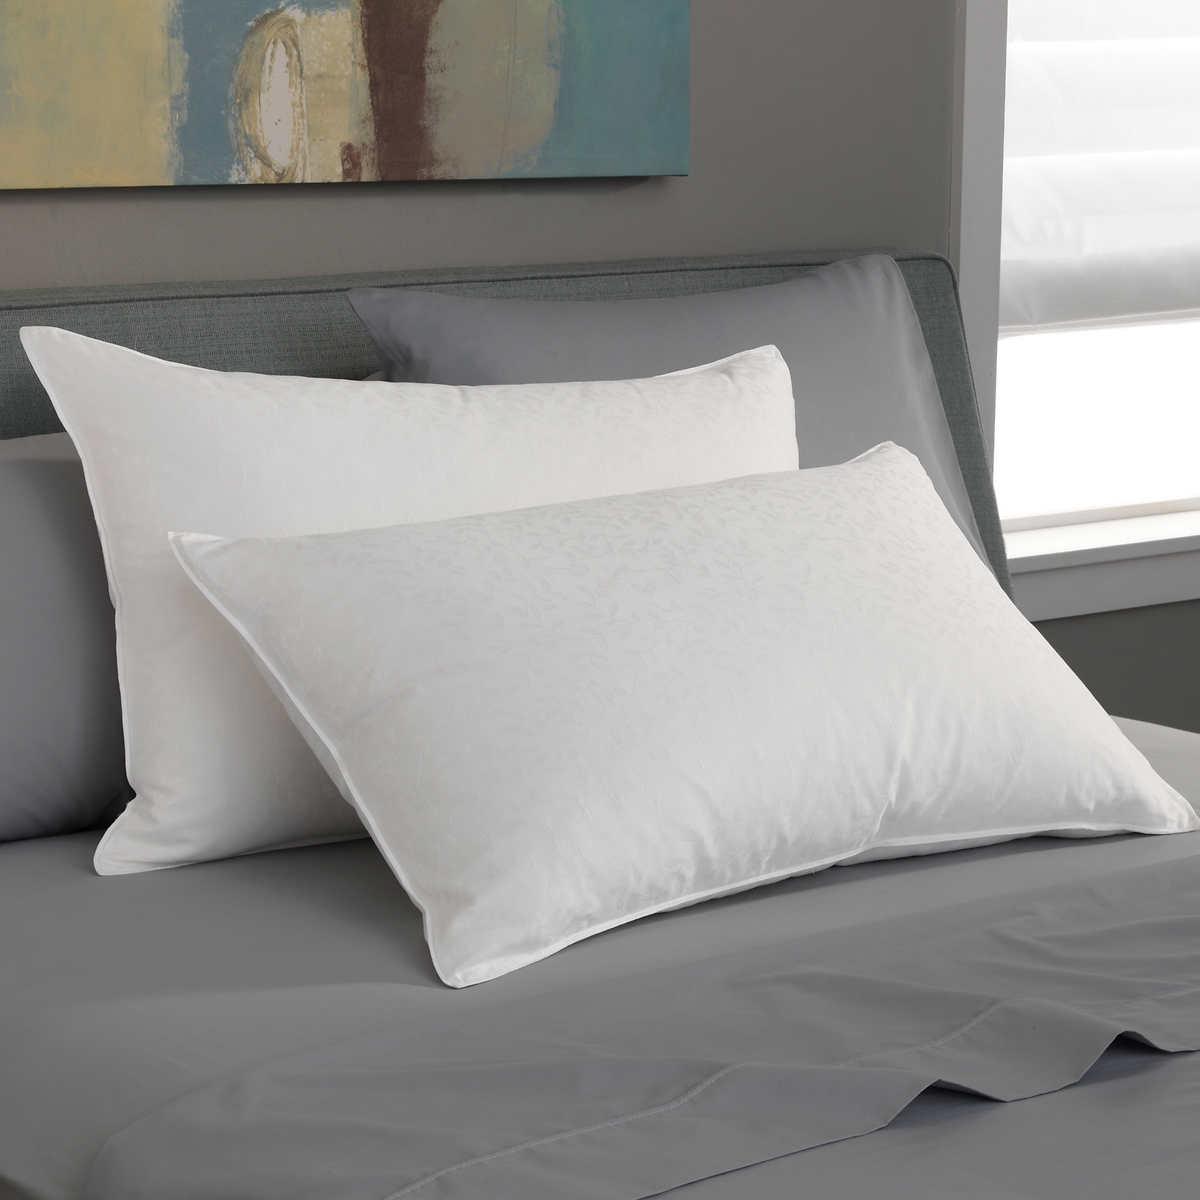 pacific coast, medium support, white goose down luxury pillow